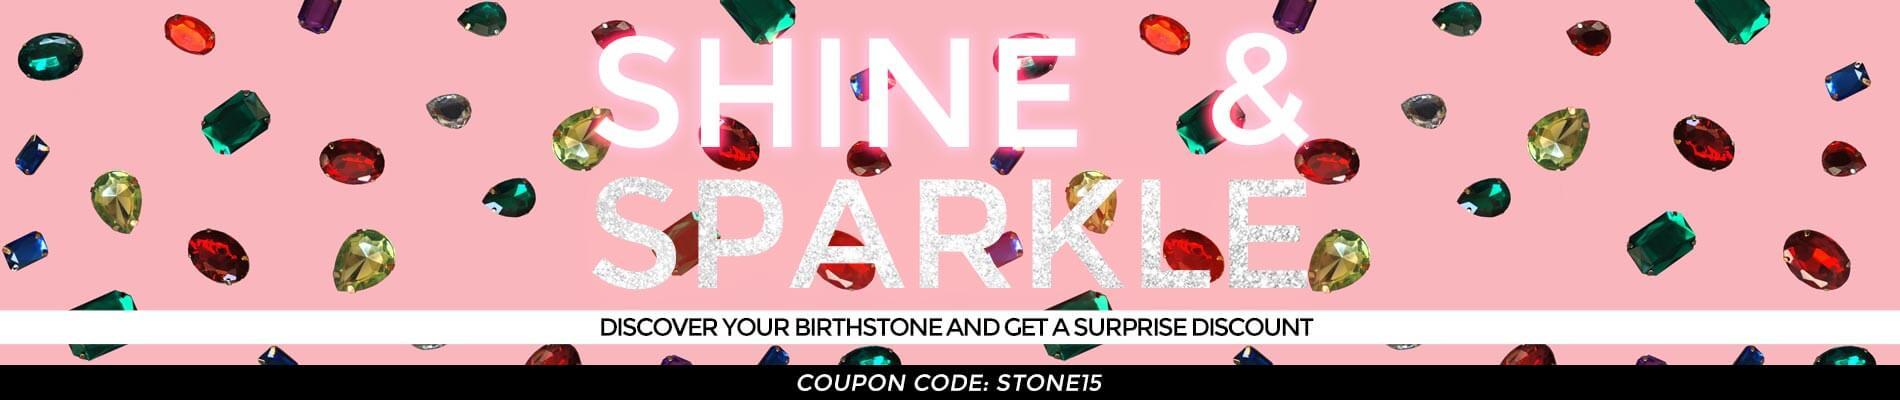 Birthstone of the month Sale 21.06 Top banner desktop